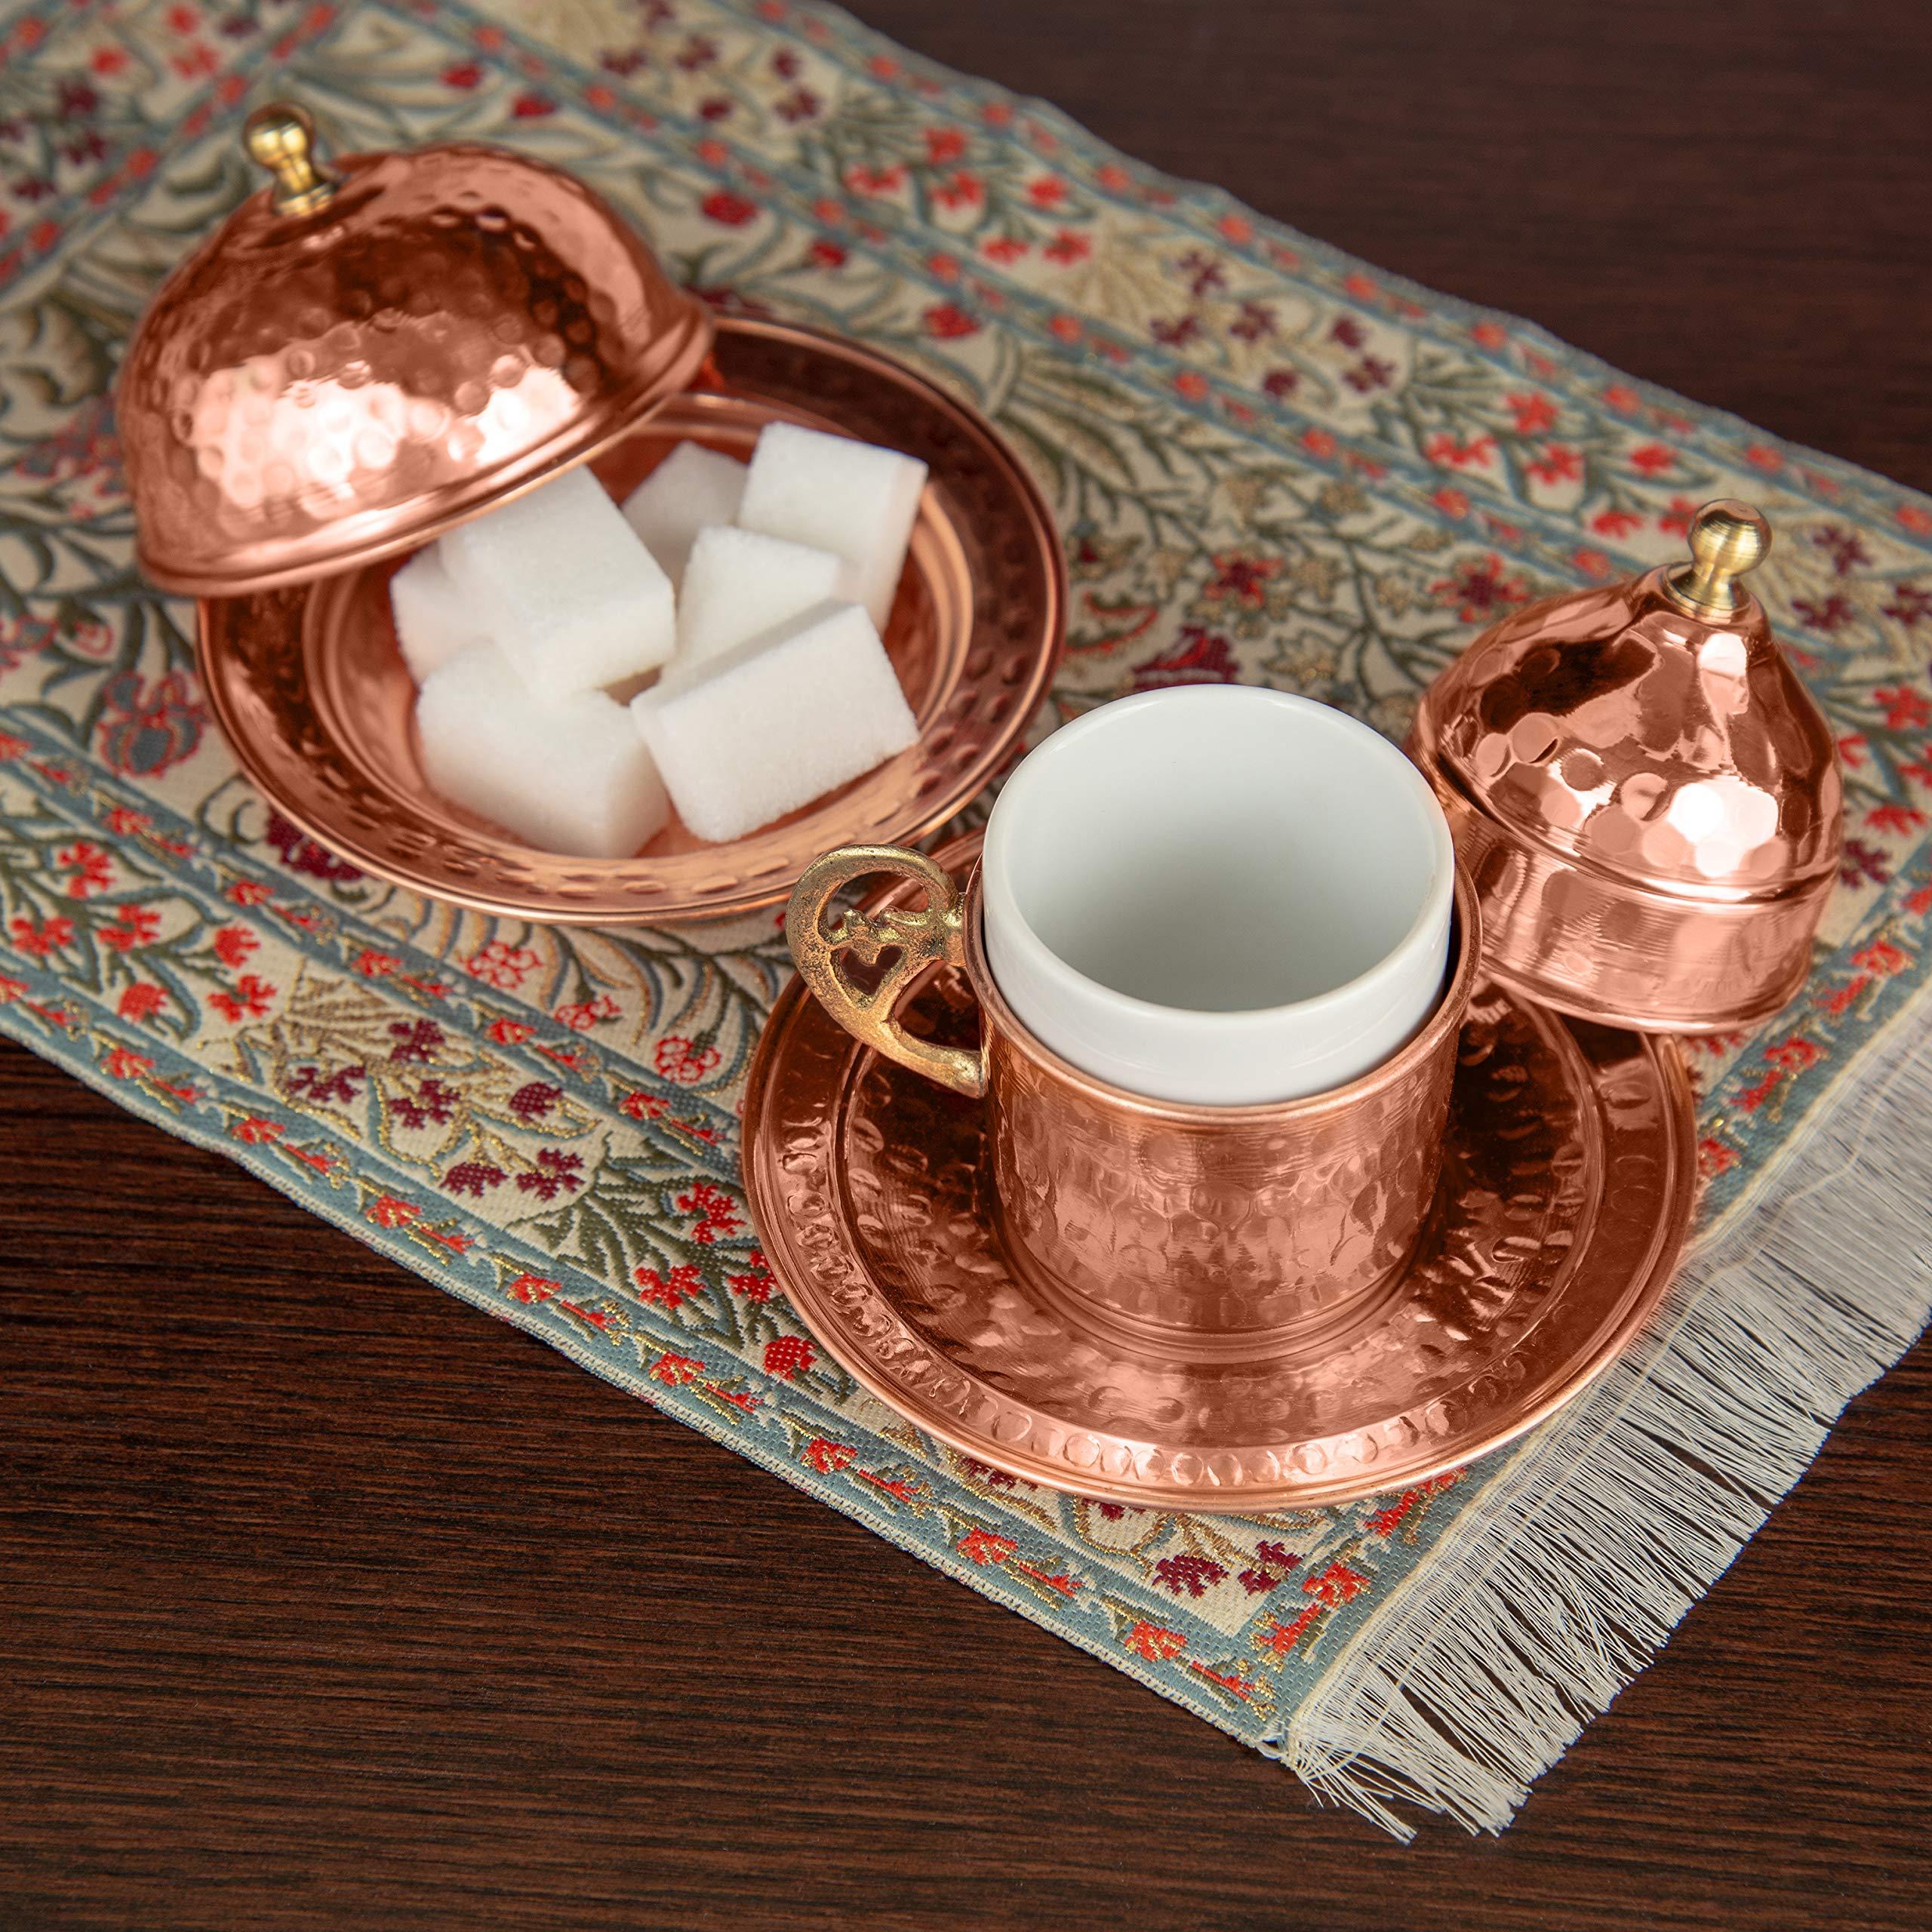 Copper Turkish Coffee Set, Two, Greek Armenian Arabic Espresso Porcelain Cups, Tray & Cezve by Mandalina Magic by Mandalina Magic (Image #8)